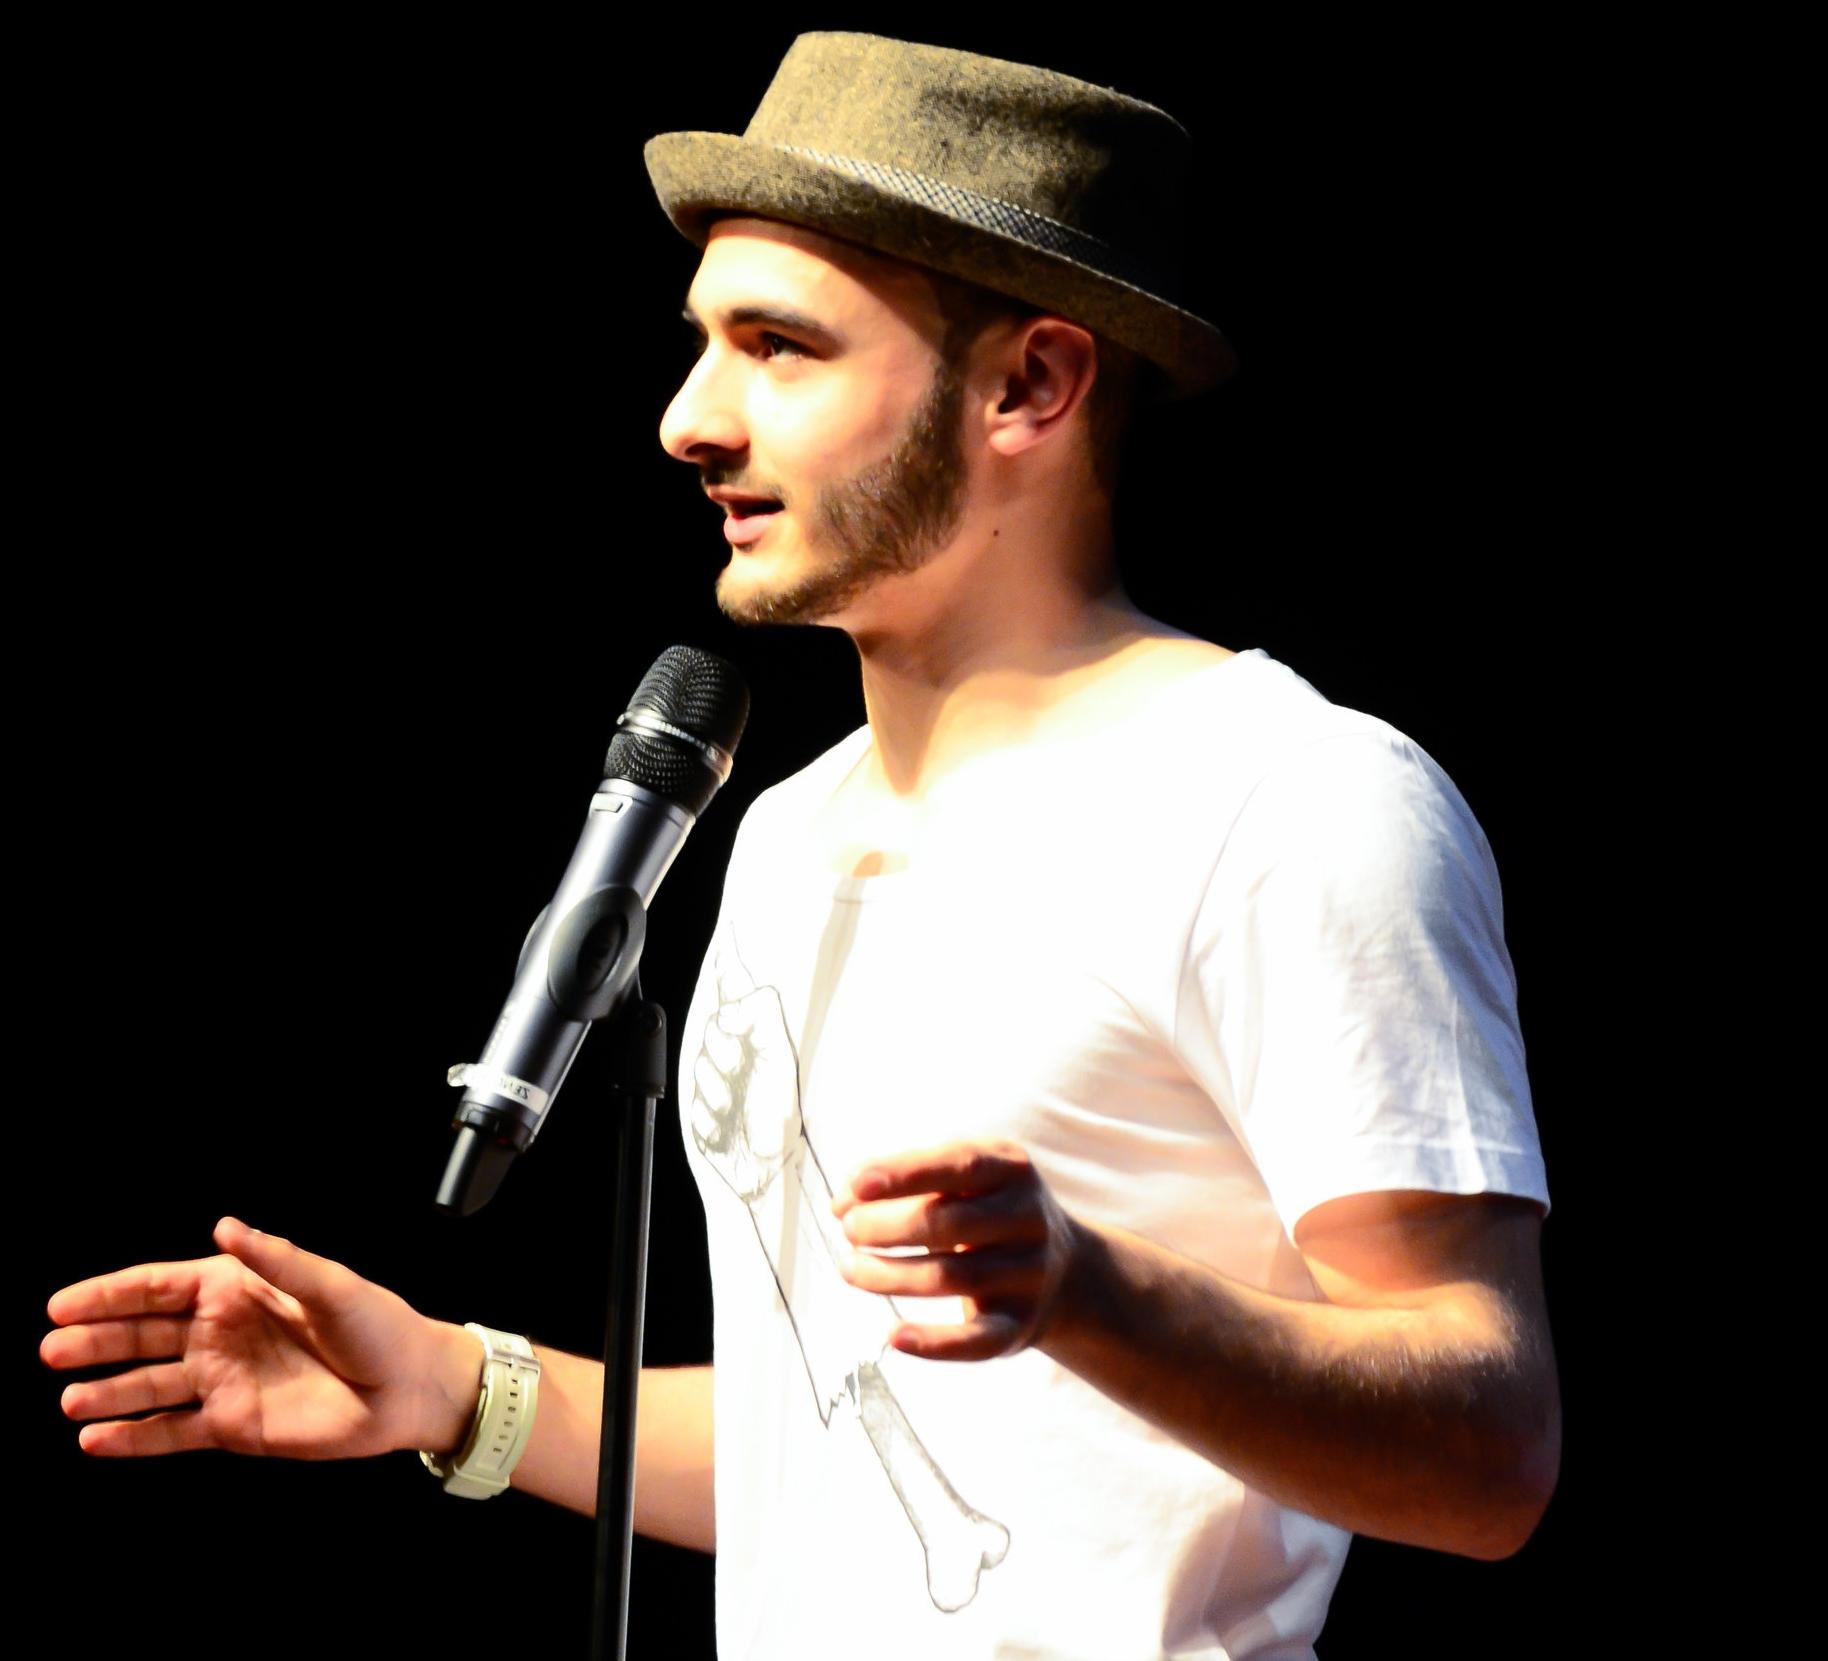 Farbod Moghaddam standup comedy